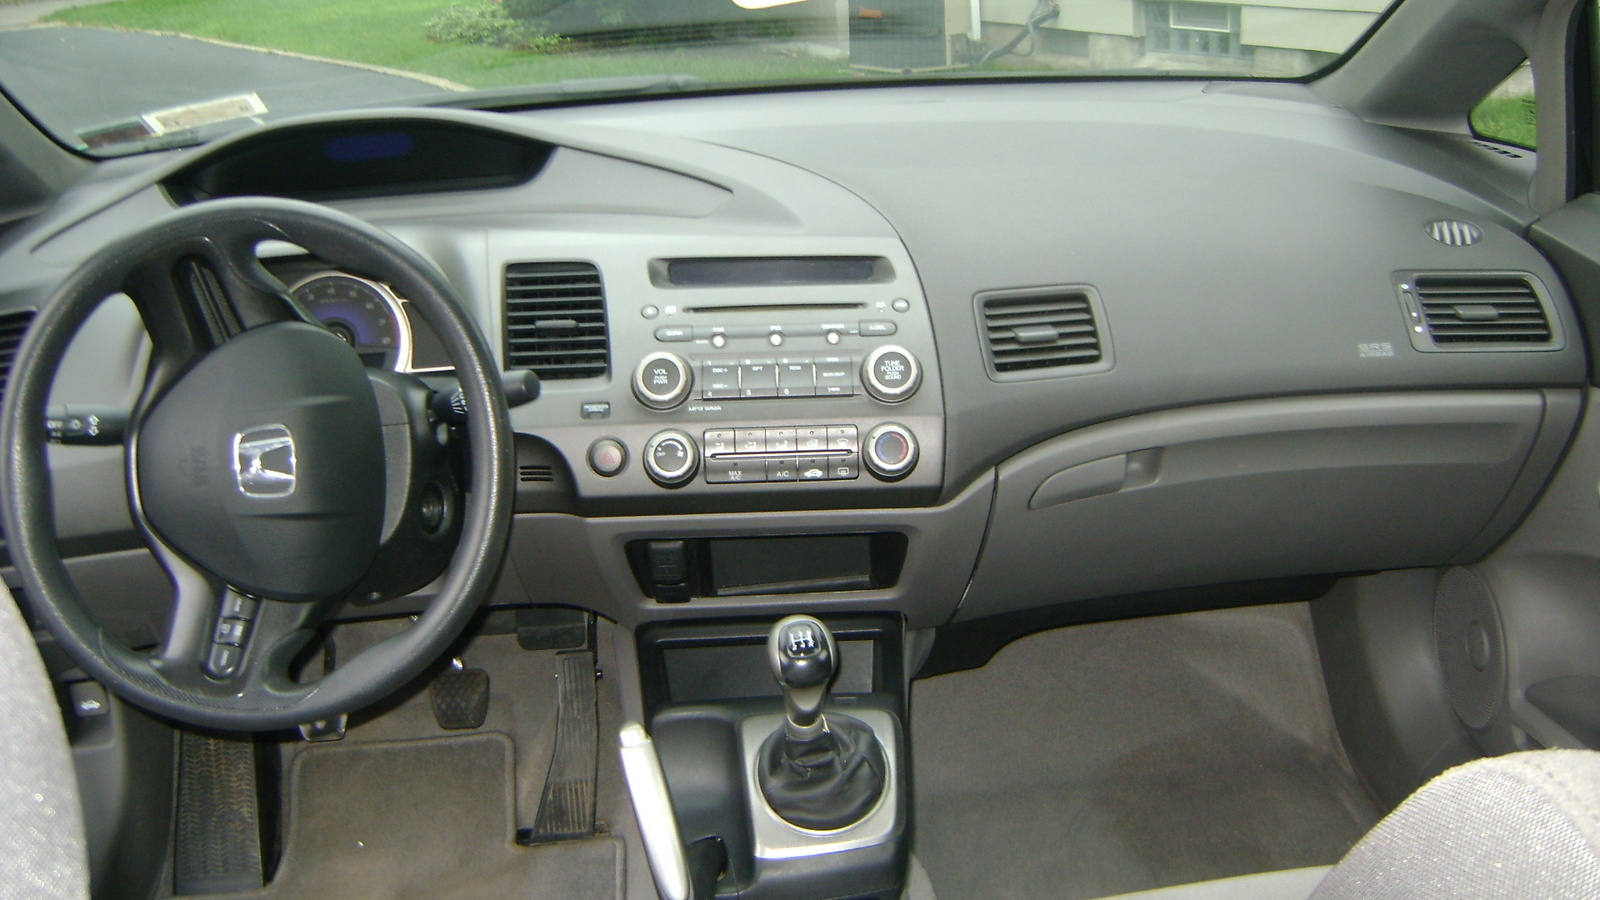 D Honda Civic Hatchback Dx Special Edition Img moreover Honda Civic Si Sedan Tjin Edition in addition Frontside in addition Img in addition D Dx Rimmed Up Slammed New Look. on 2011 honda civic tires